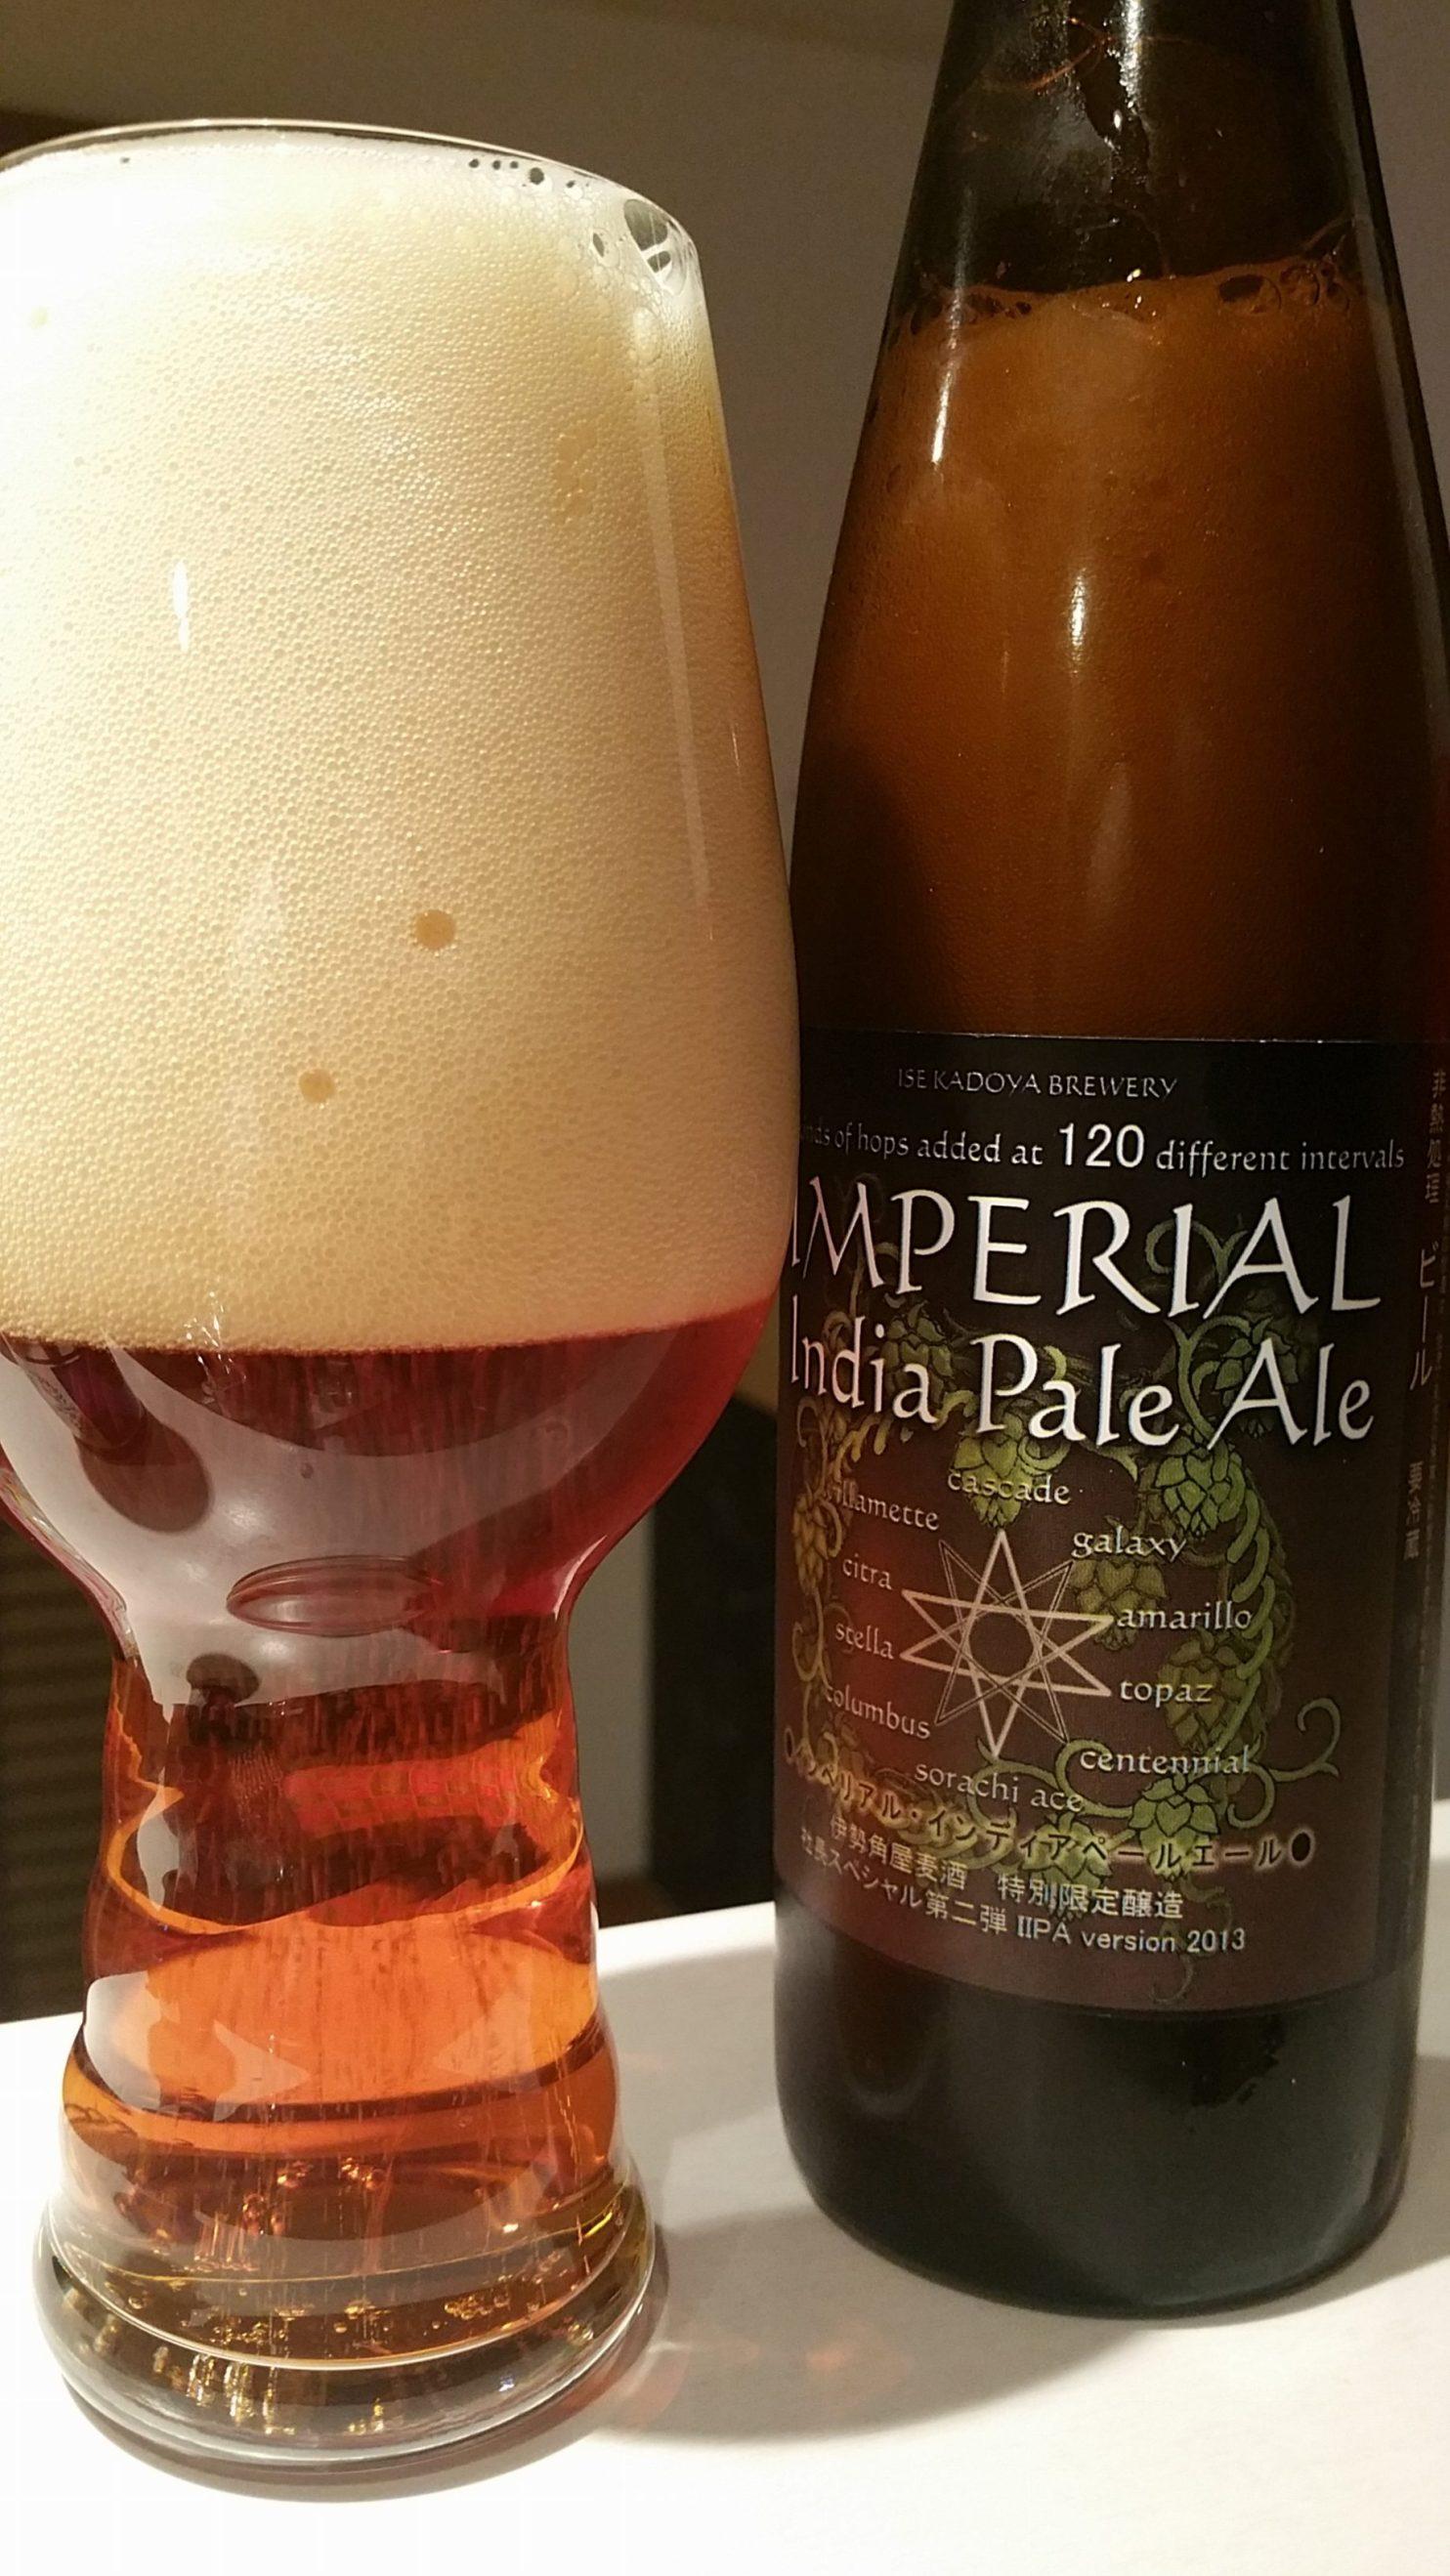 Ise Kadoya Imperial India Pale Ale